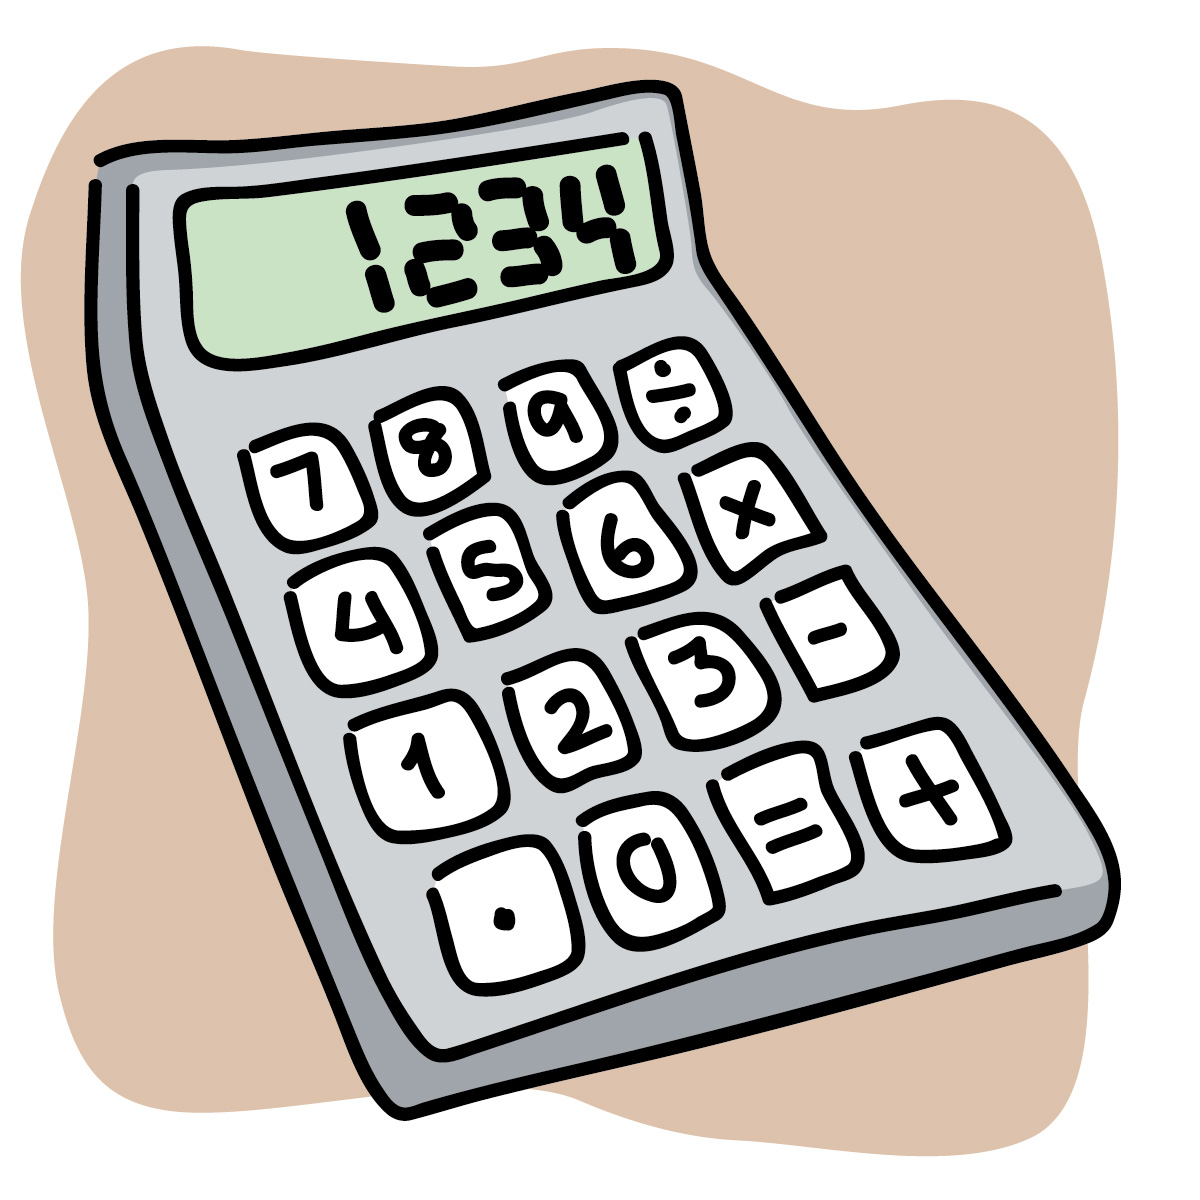 Weight Lifting Calculator Crossfit Londo-Weight Lifting Calculator Crossfit London-16